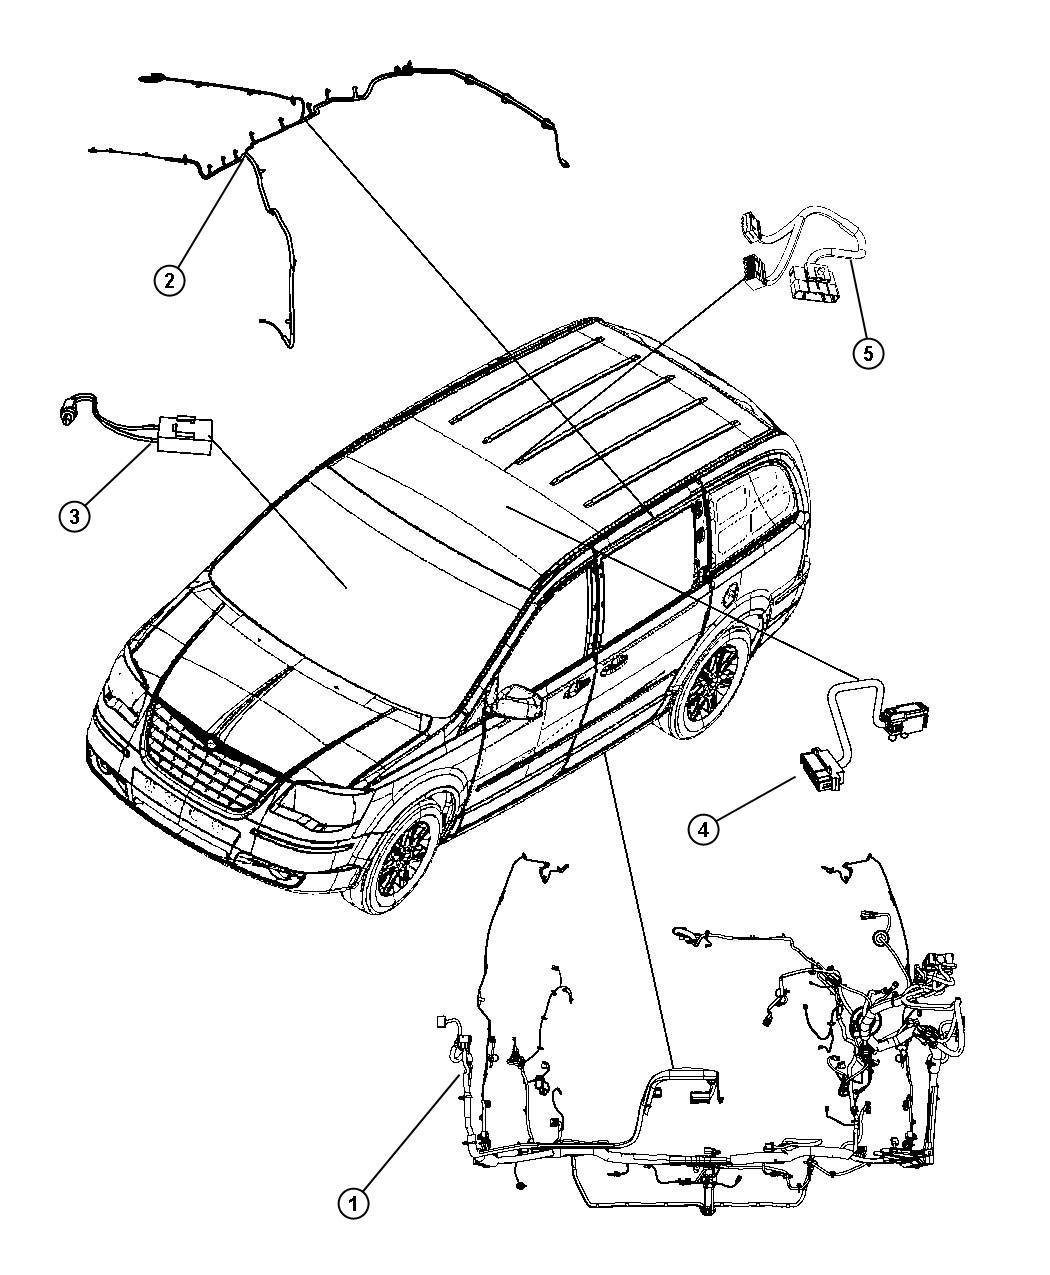 2008 Dodge Grand Caravan Sxt 3 8l V6 Wiring  Body  Upper